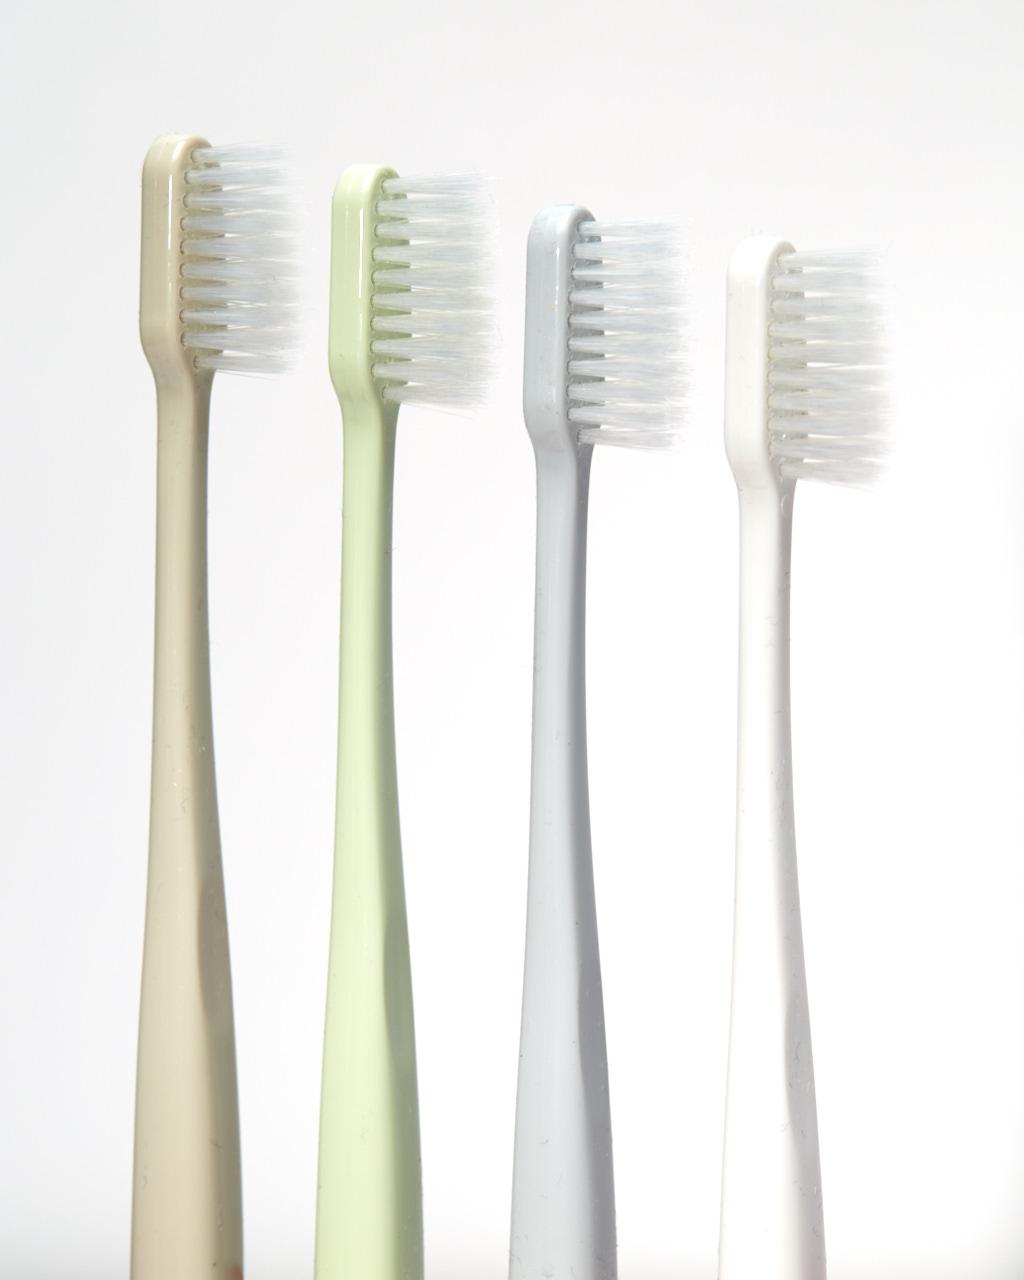 Toothbrushes_004.jpg